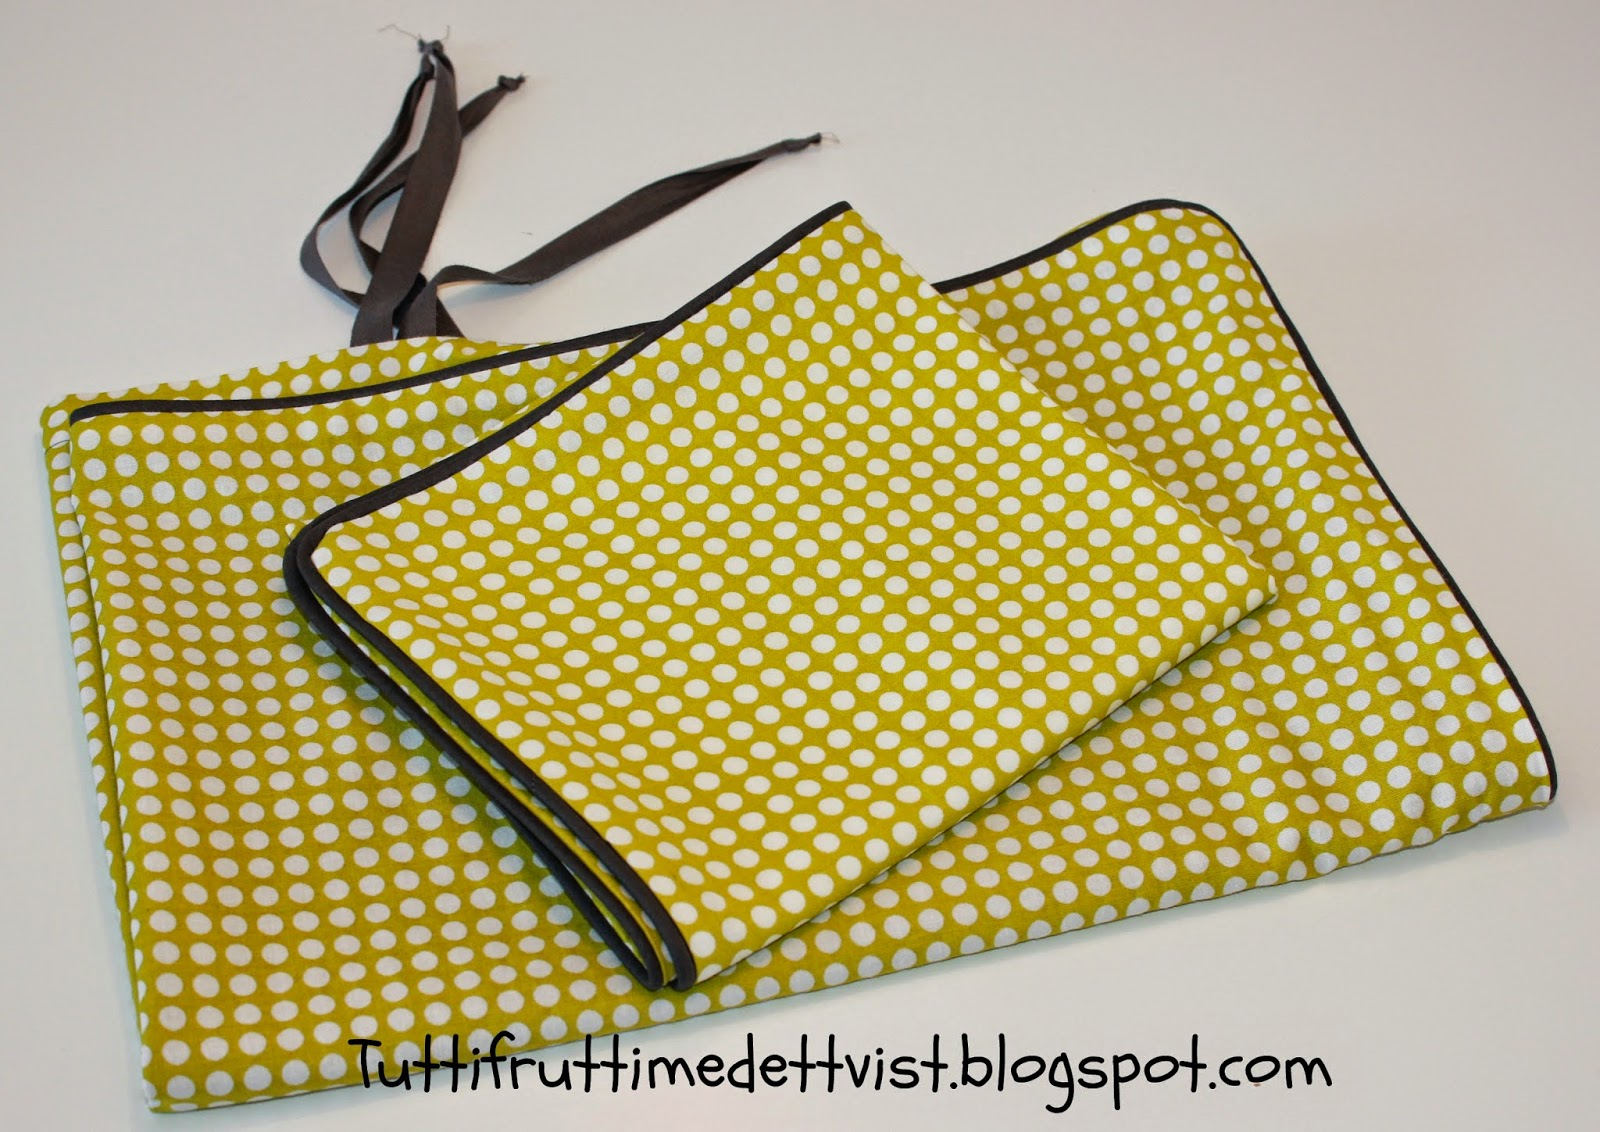 Tuttifrutti med et tvist: lime baby sengetøj med prikker